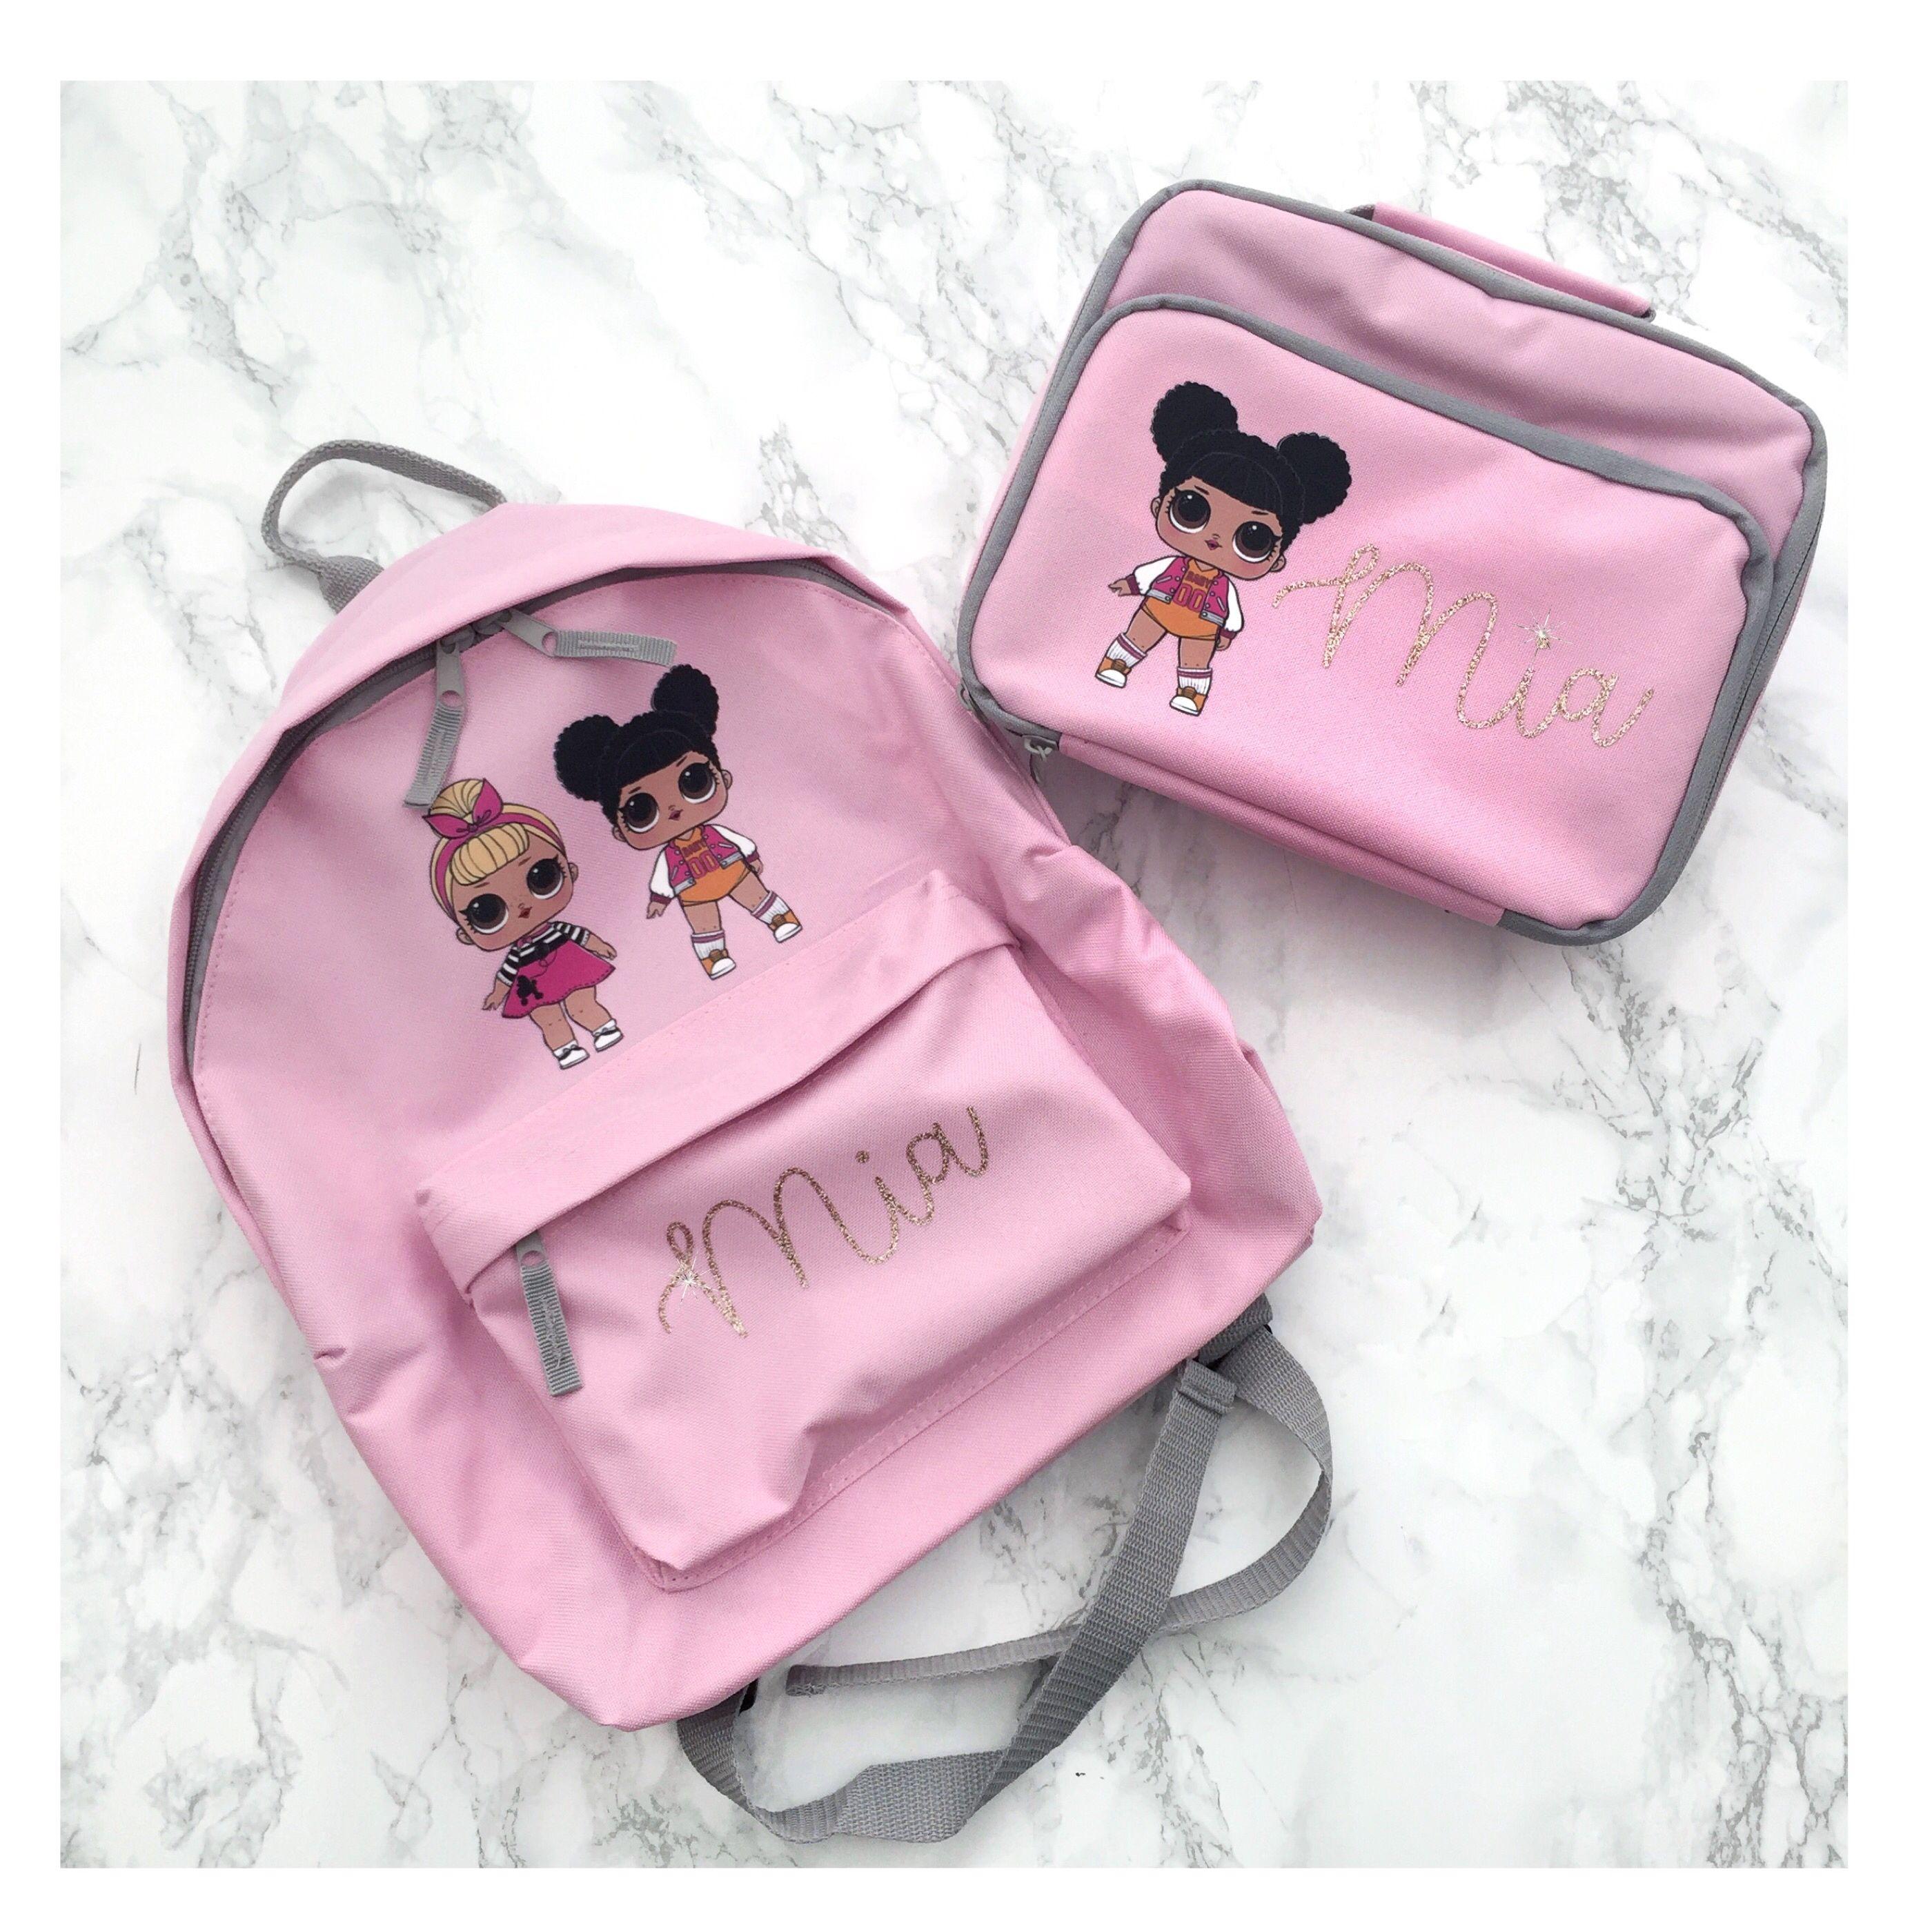 Margarita Lover Kids Backpack Personalized